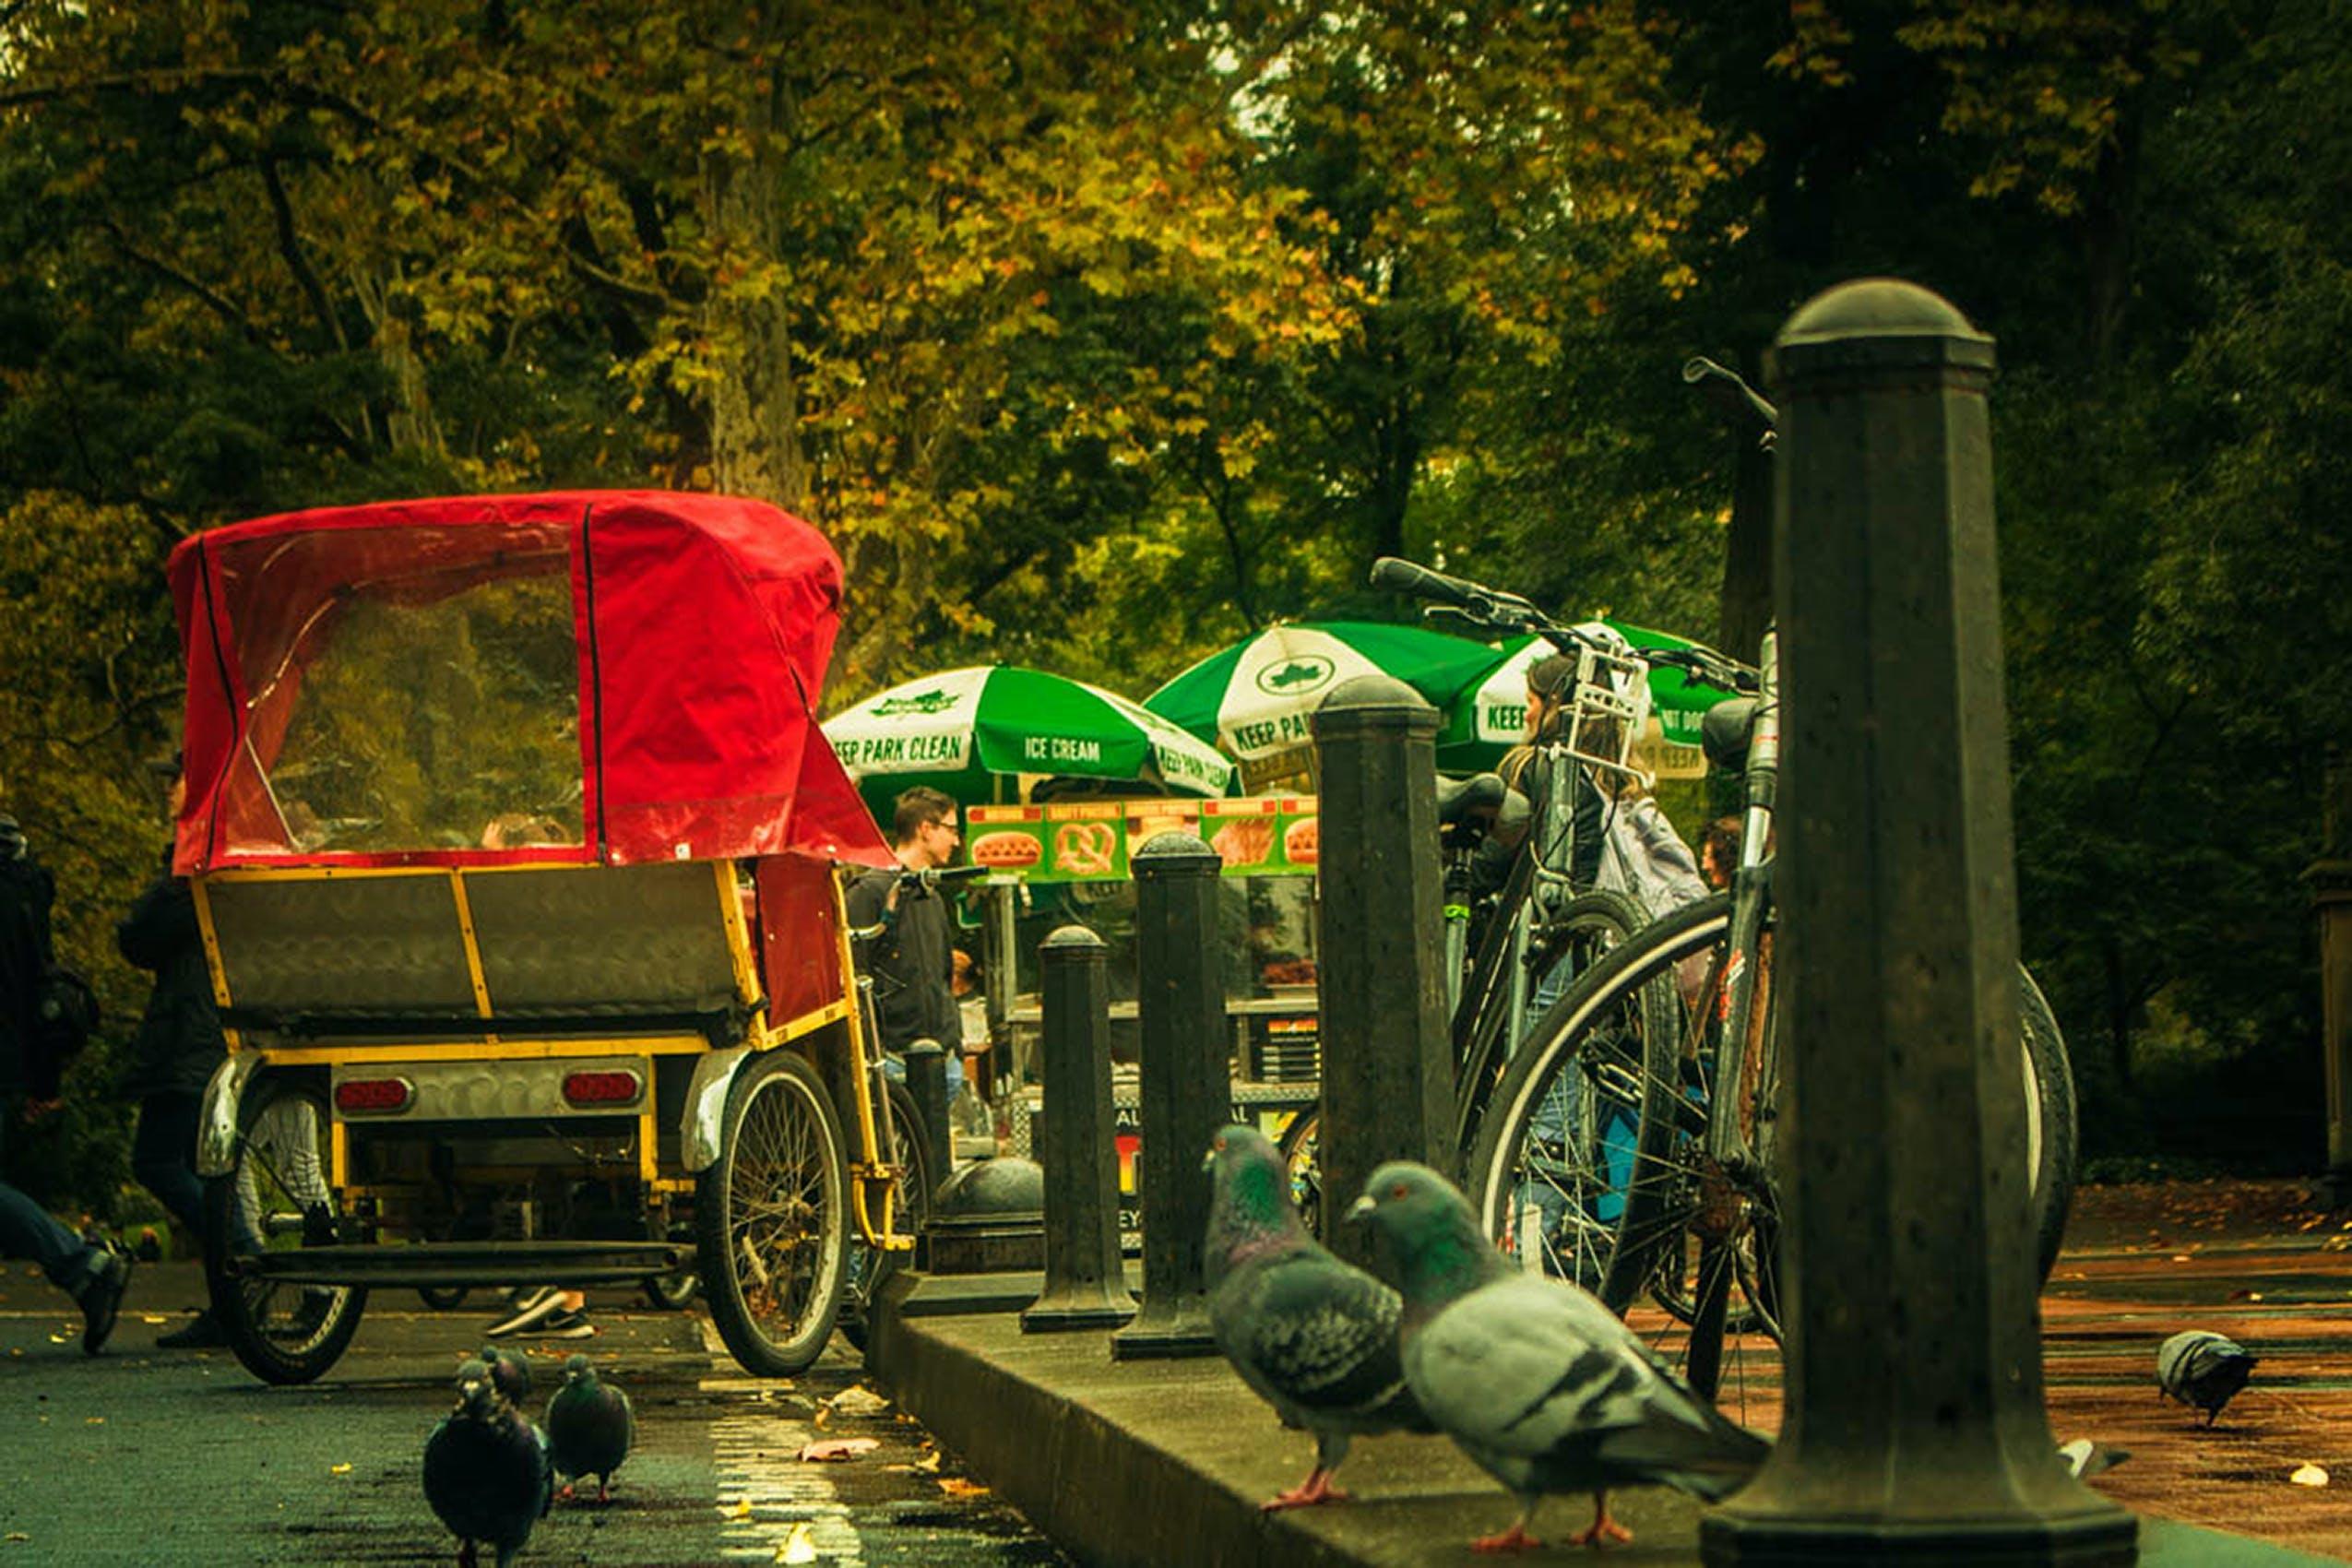 Free stock photo of #birds, #central park, #city parks, #city vibes